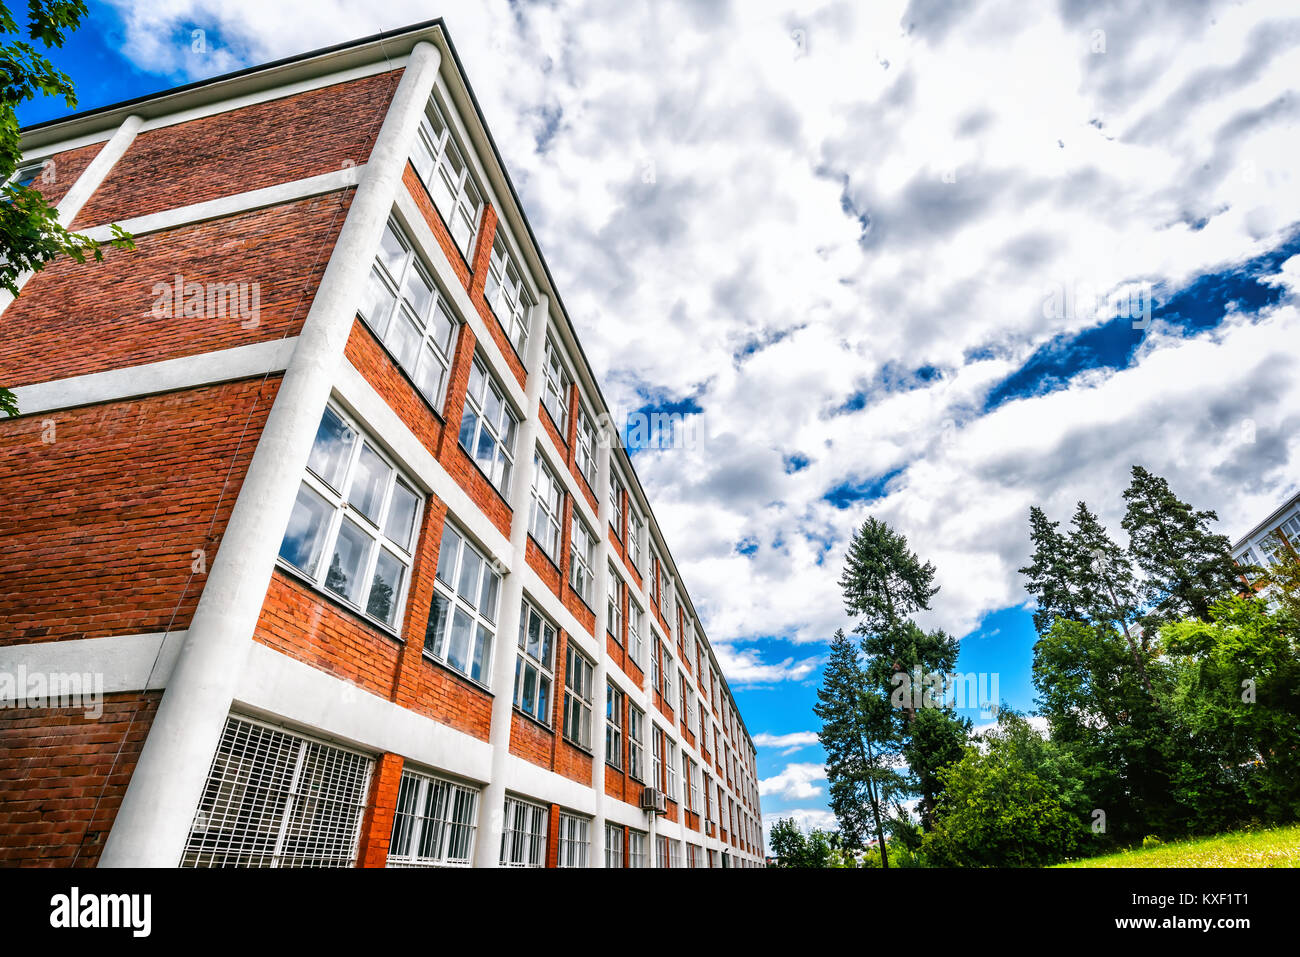 Home Design Zlín Part - 29: Architectural Design Of Administrative Buildings In Zlin, Czech Republic